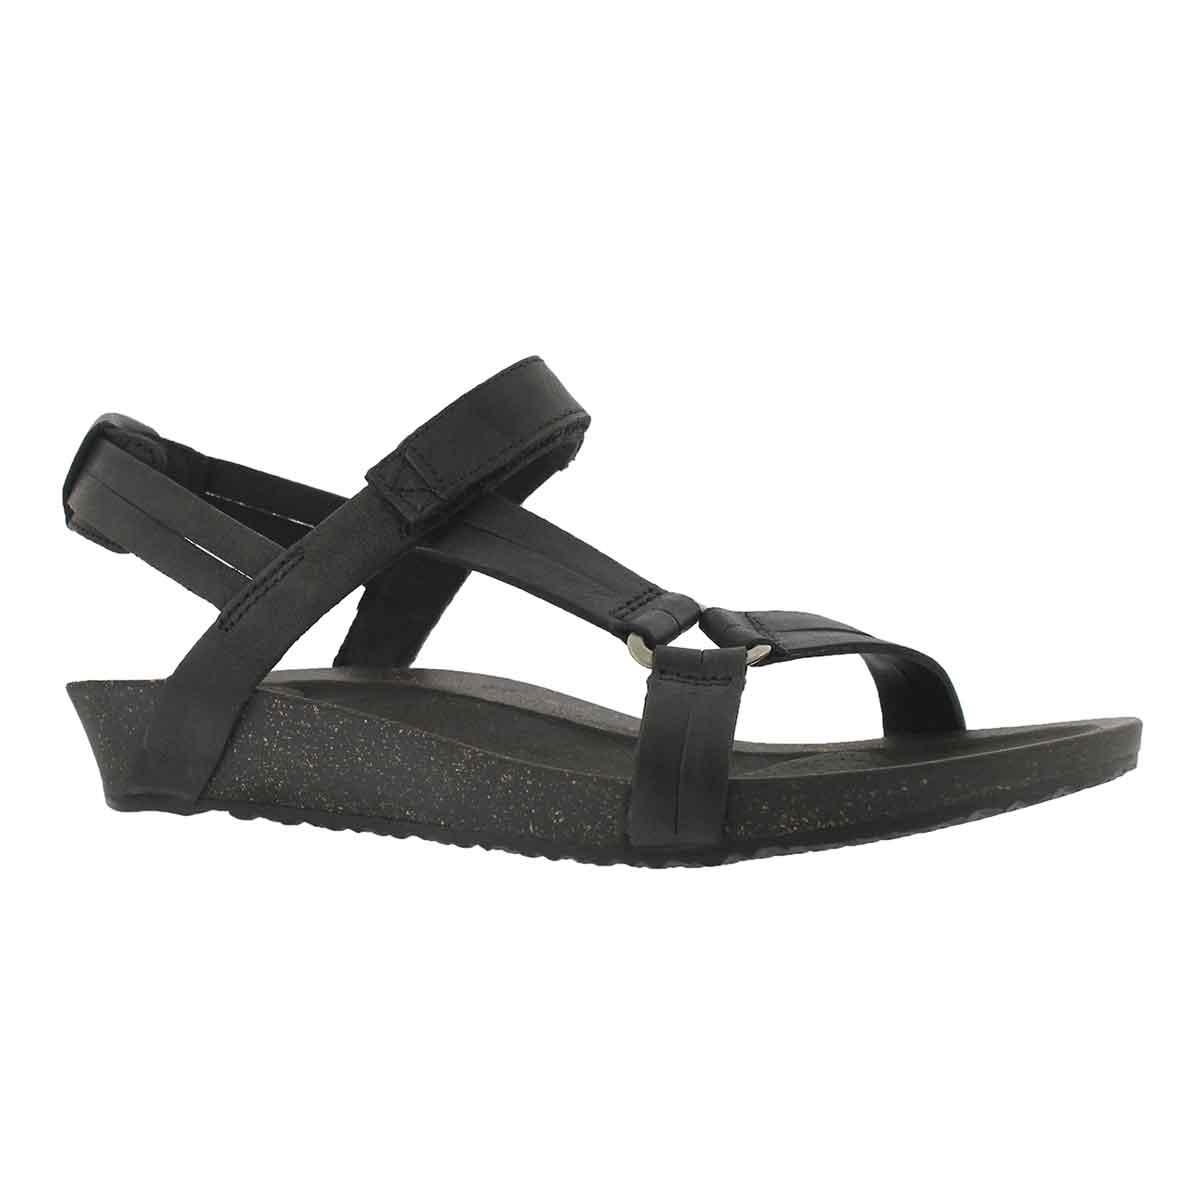 Women's YSIDRO UNIVERSAL black casual sandals